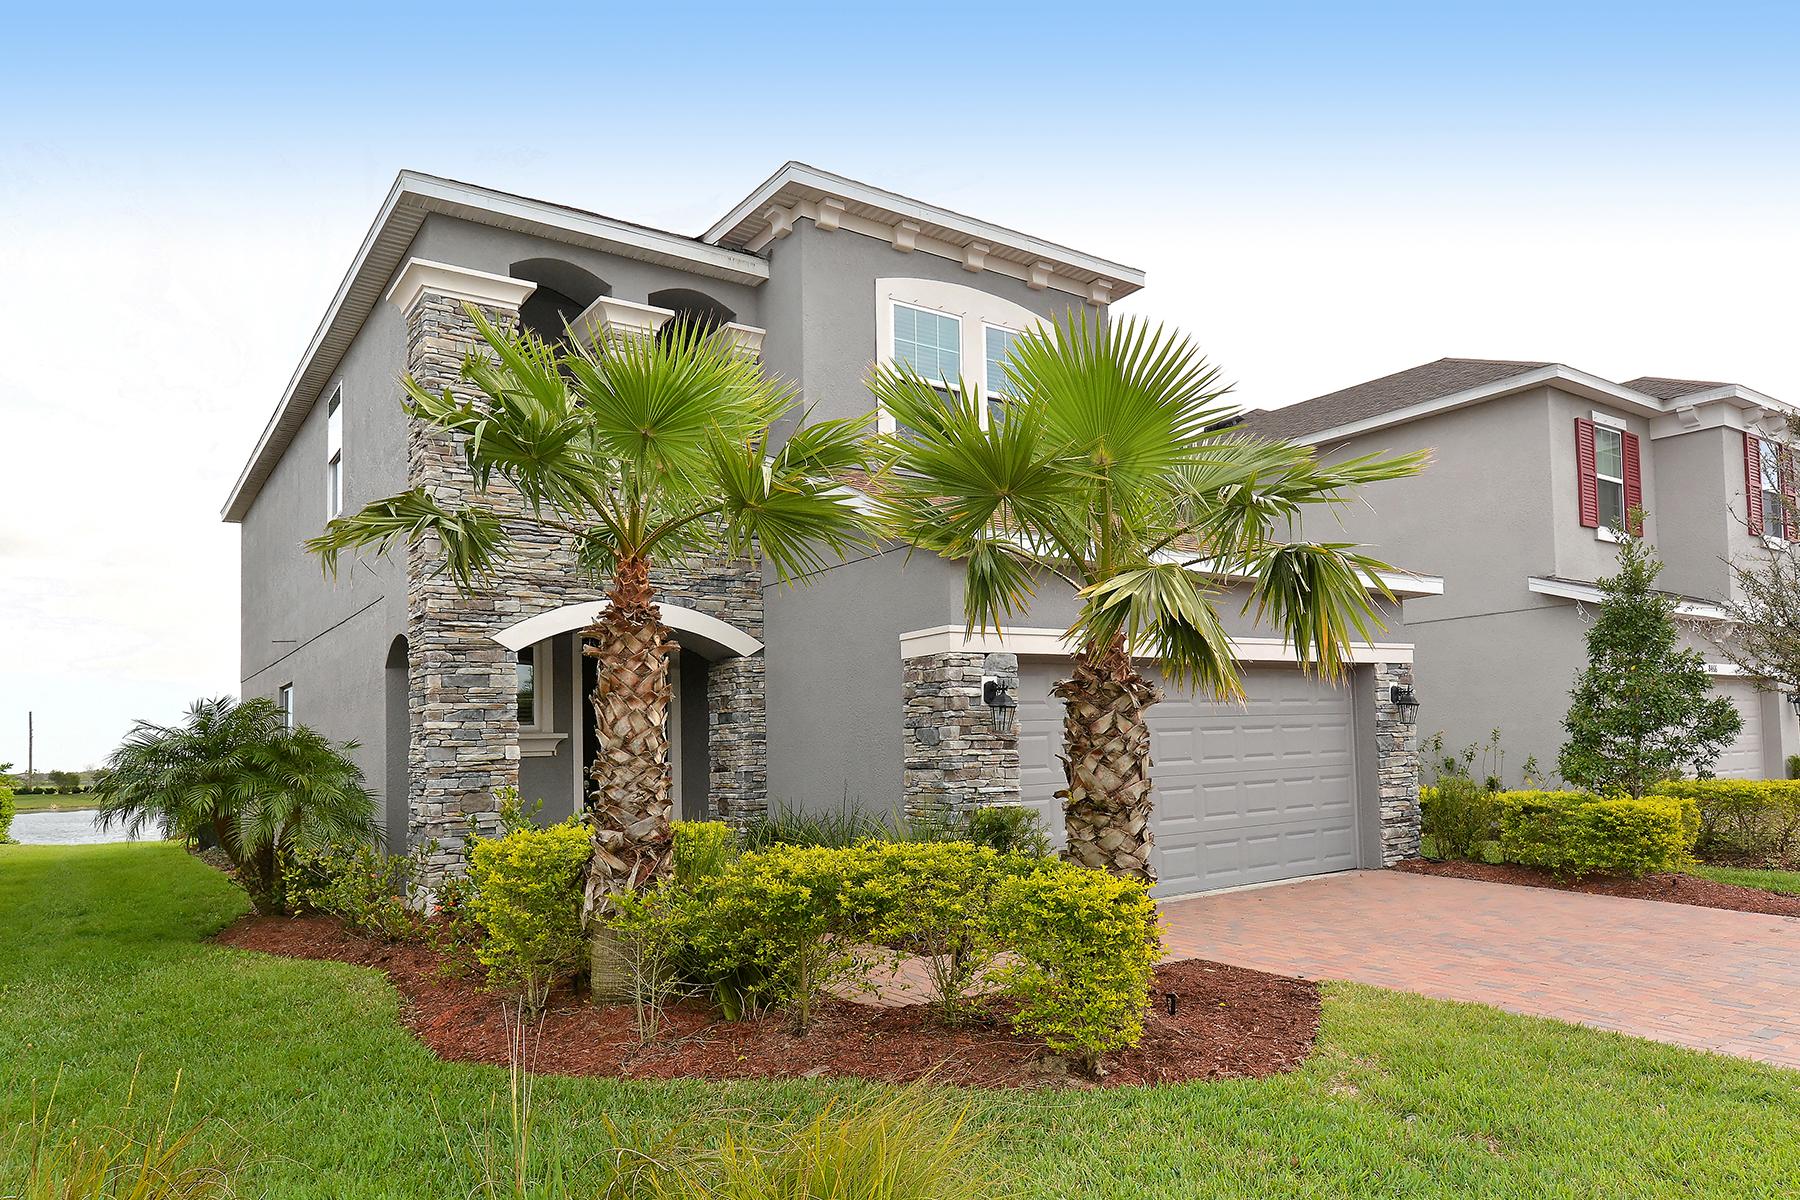 Villa per Vendita alle ore PALMER LAKE 8460 Nandina Dr Sarasota, Florida, 34240 Stati Uniti